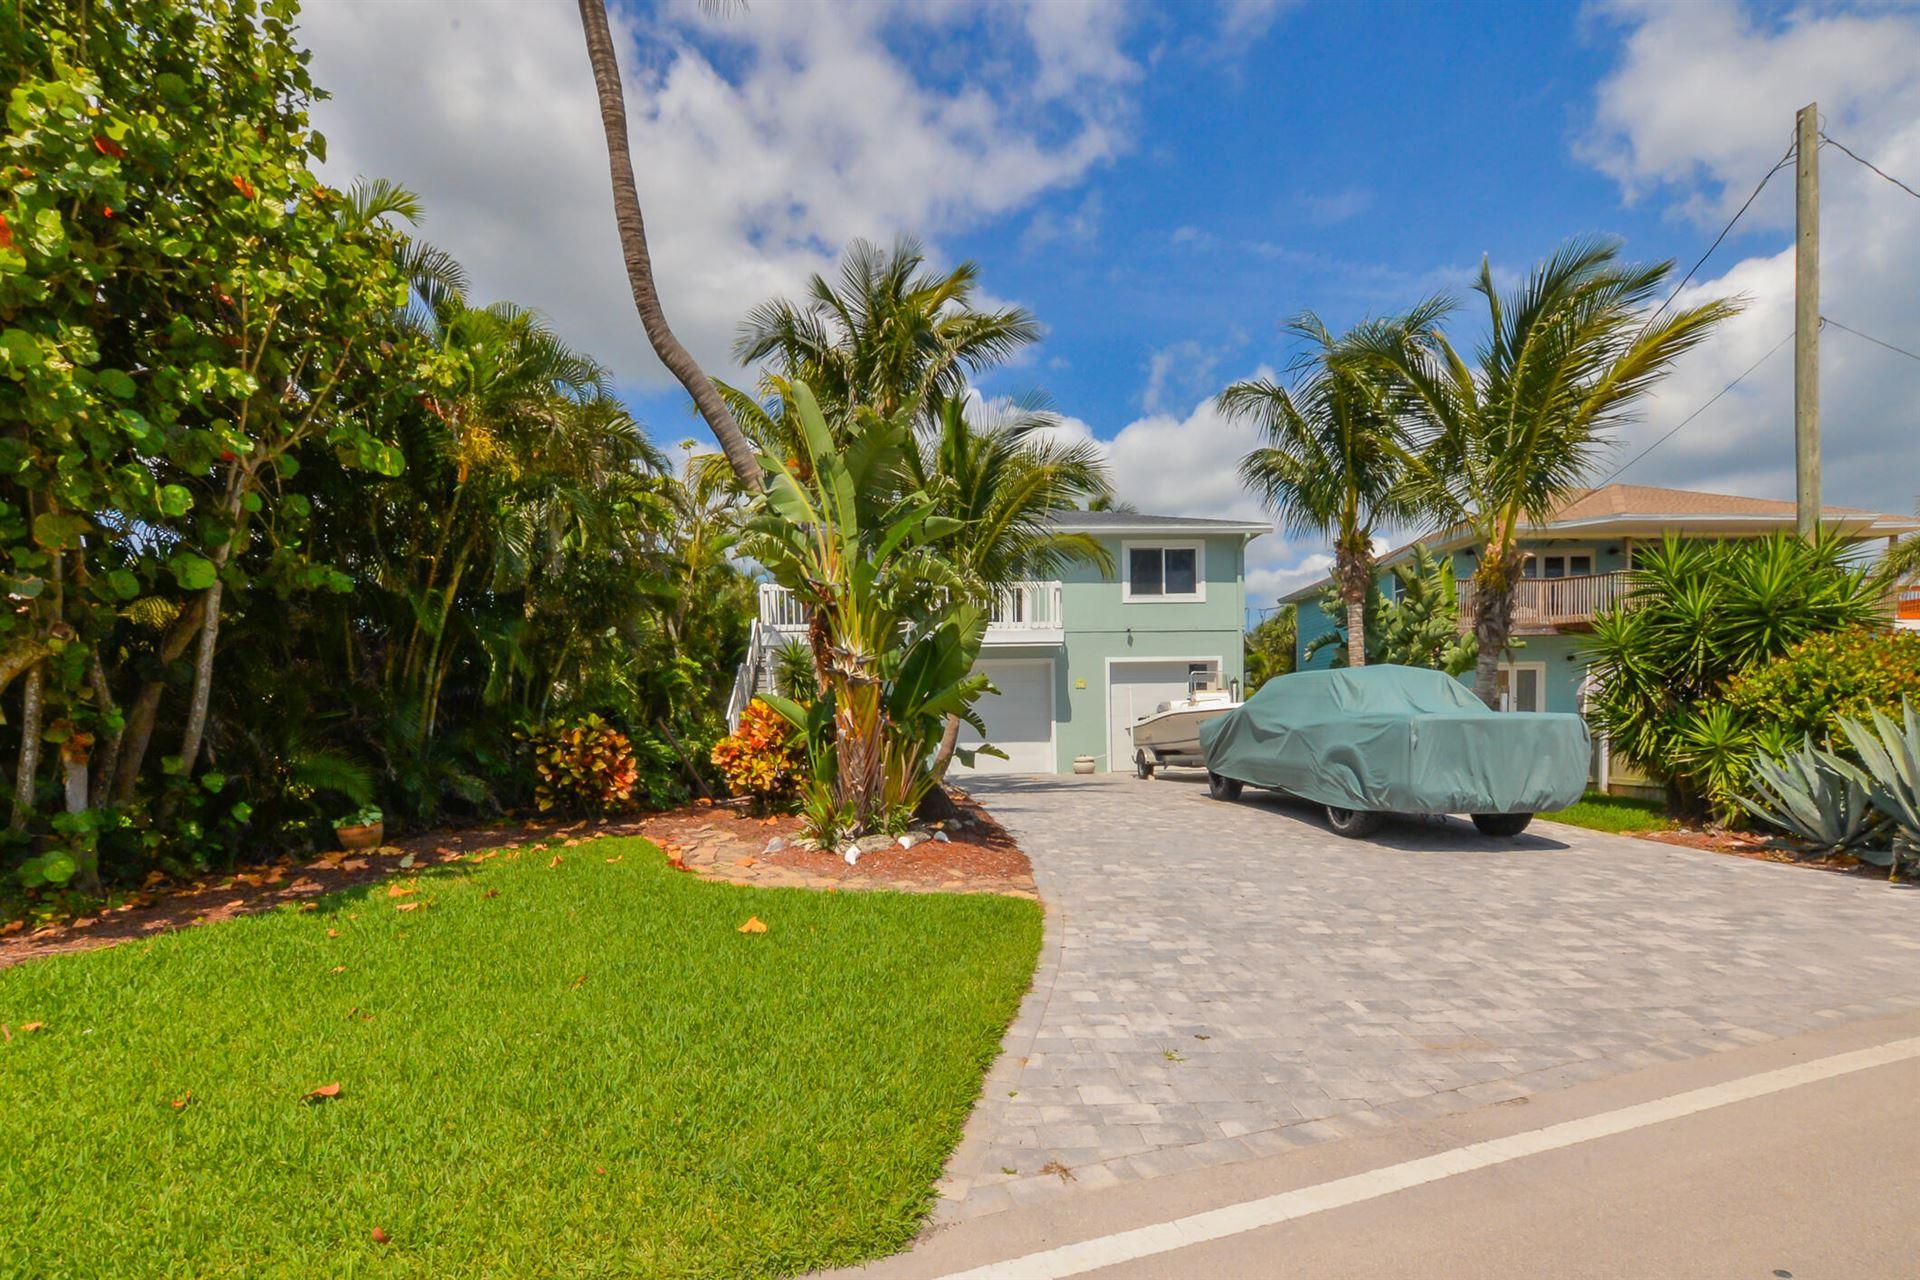 Photo of 413 Hernando Street, Fort Pierce, FL 34949 (MLS # RX-10714574)